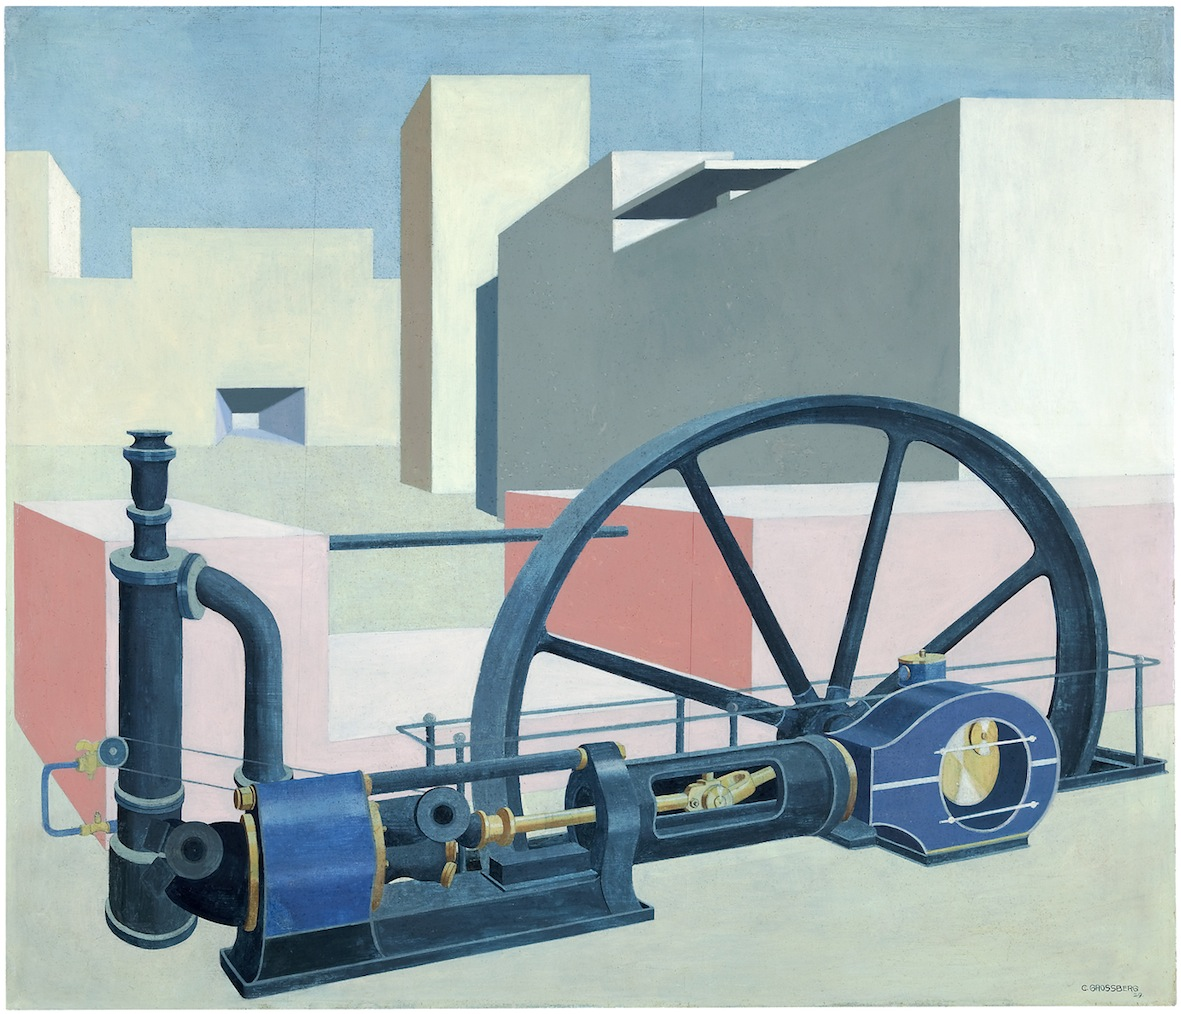 Carl Grossberg, Komposition mit Turbine, 1929, olio su tavola, 60x70 cm